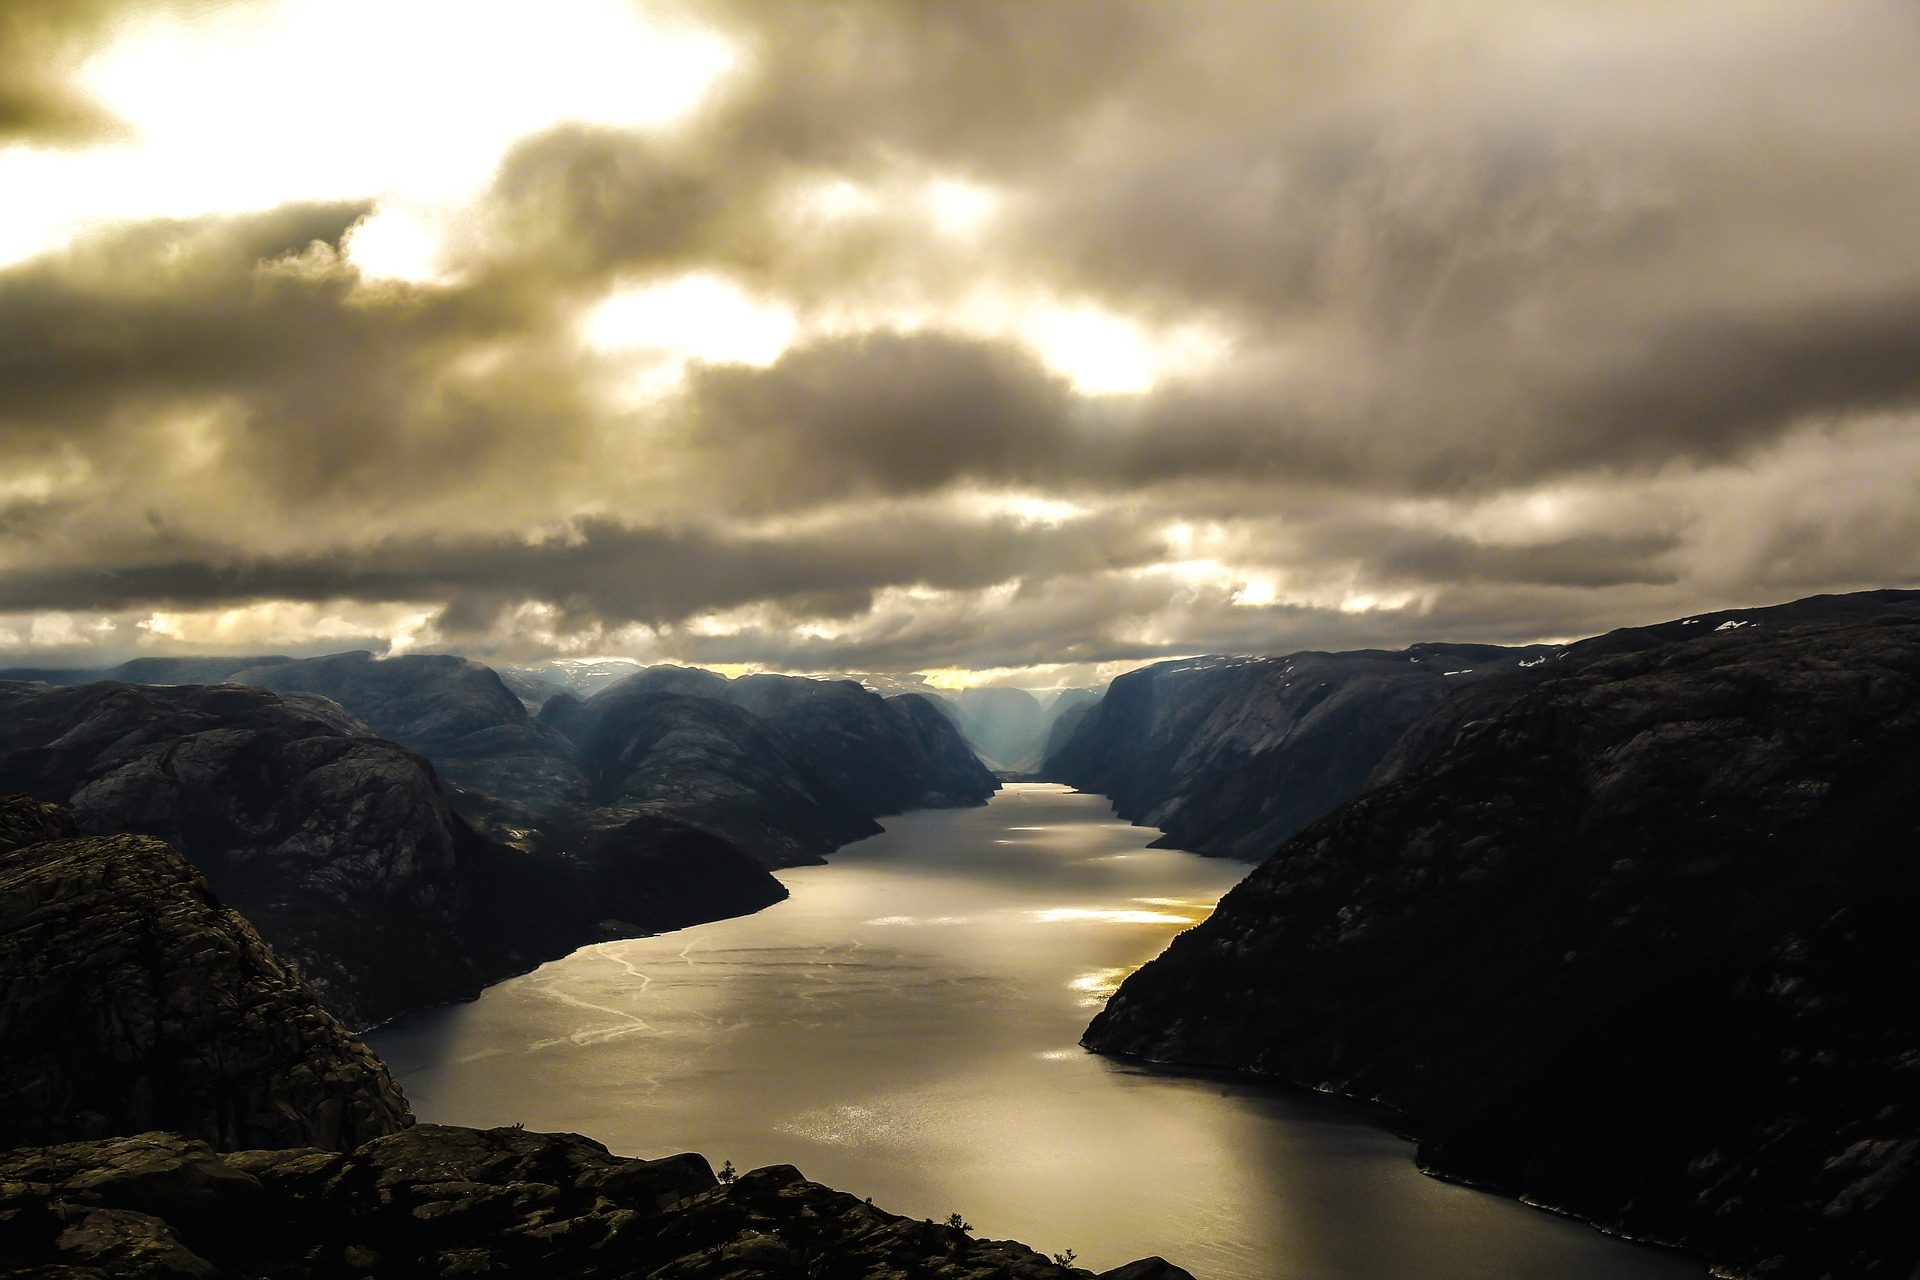 fjord-1226822_1920.jpg